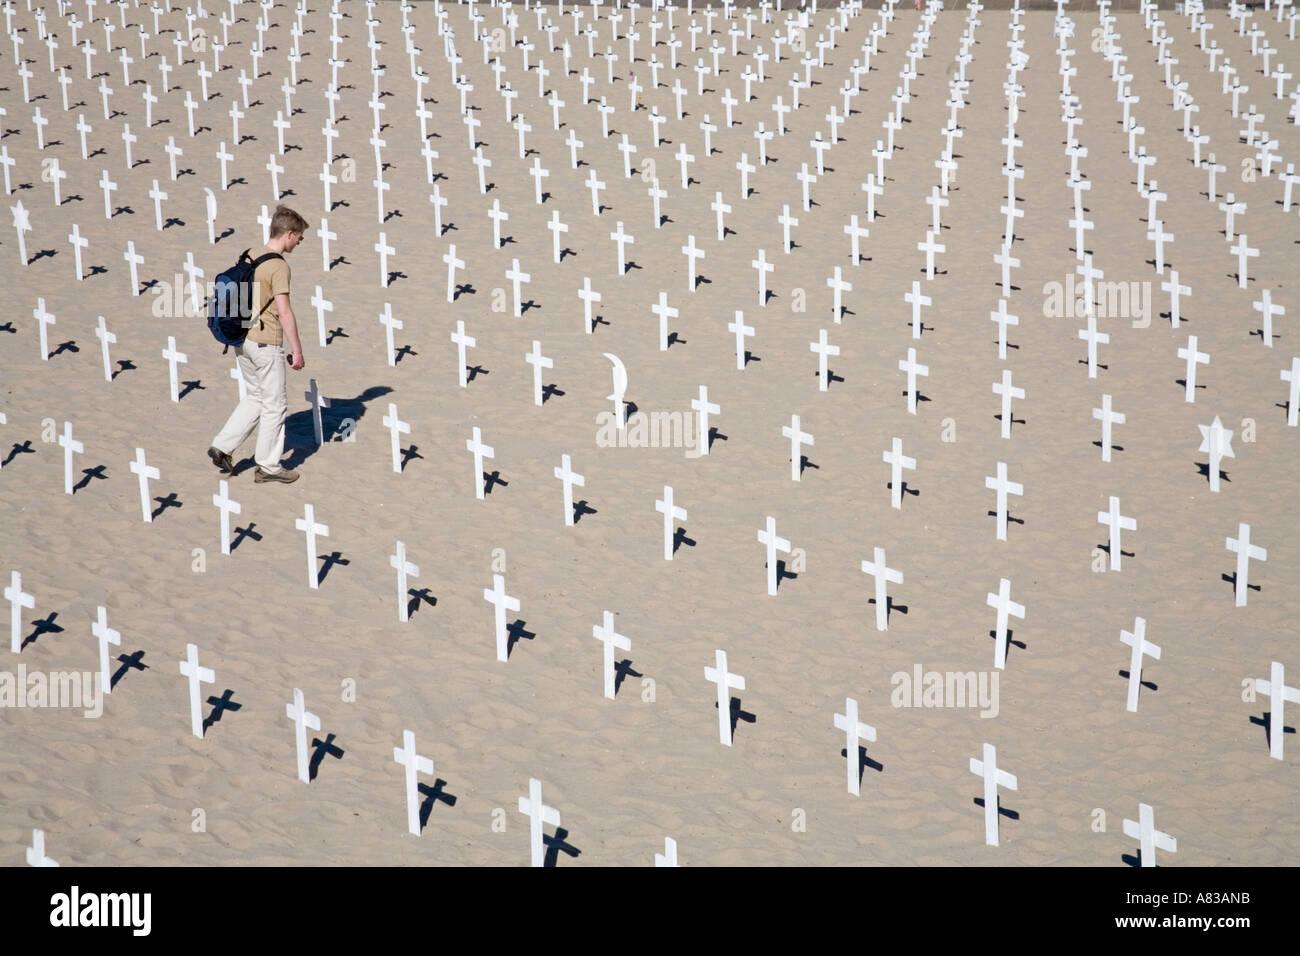 Arlington West Anti War Memorial Santa Monica Los Angeles California United States of America Protesting the war in Iraq - Stock Image